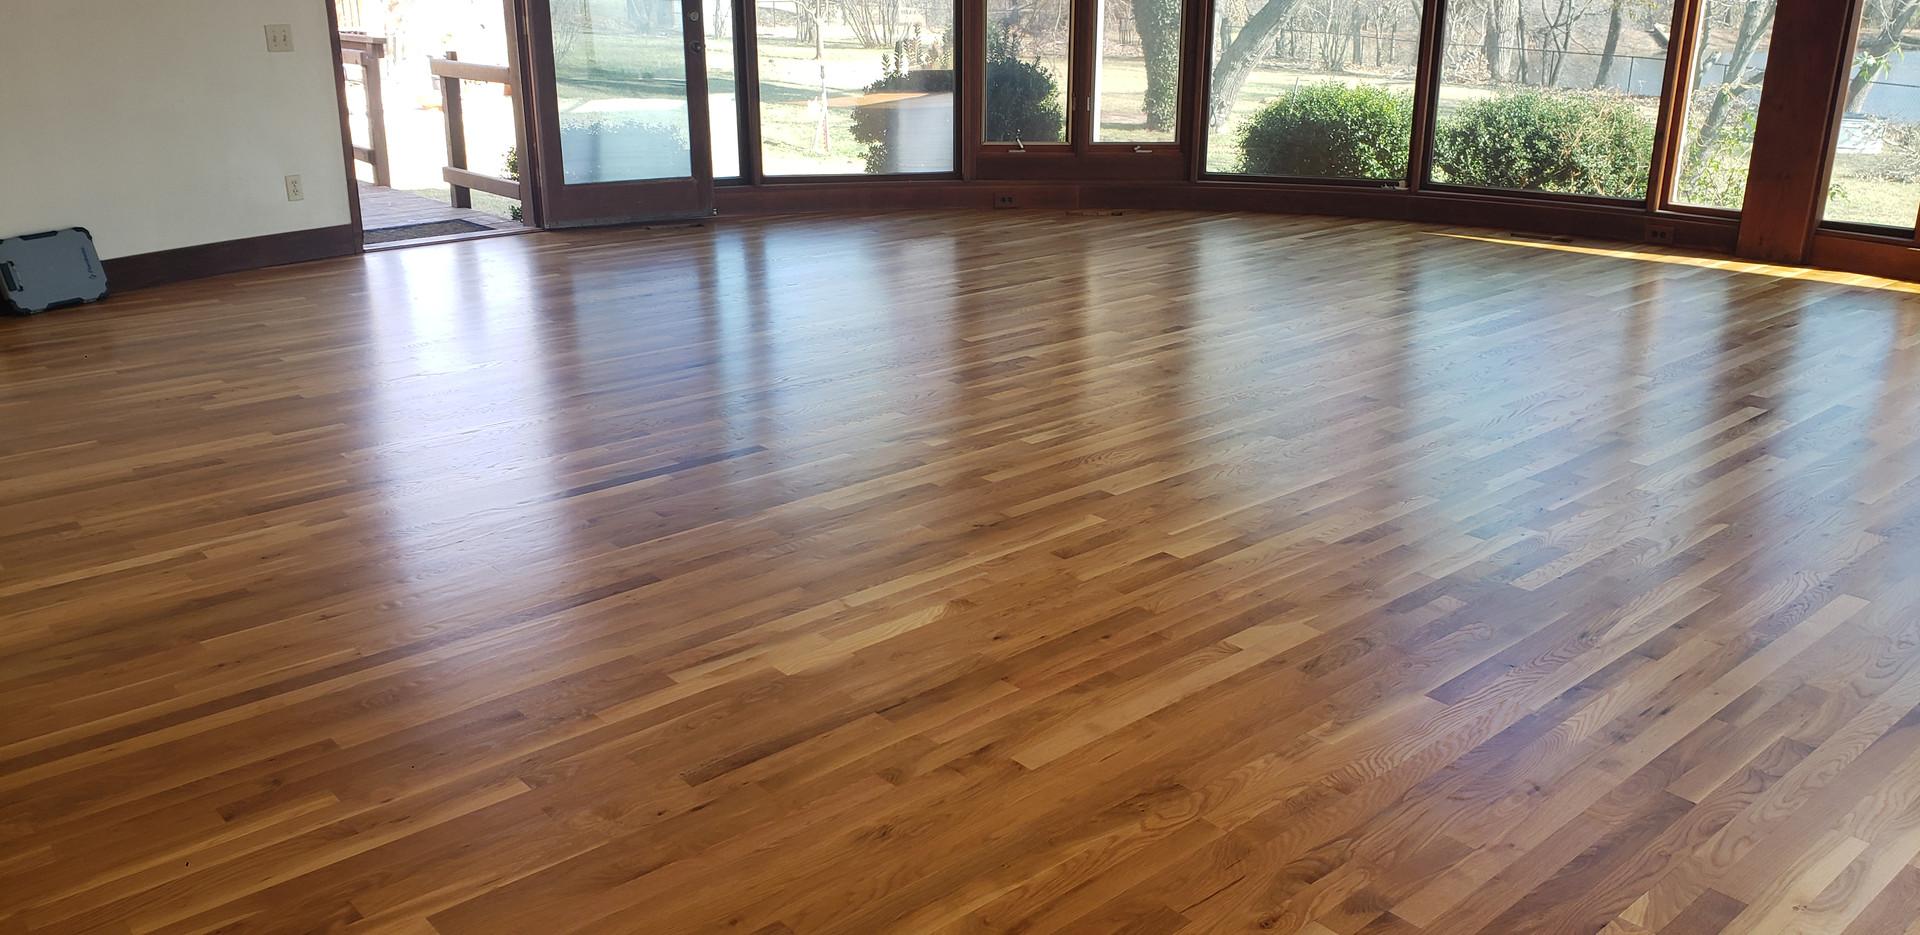 Commercial Wood Floor Install